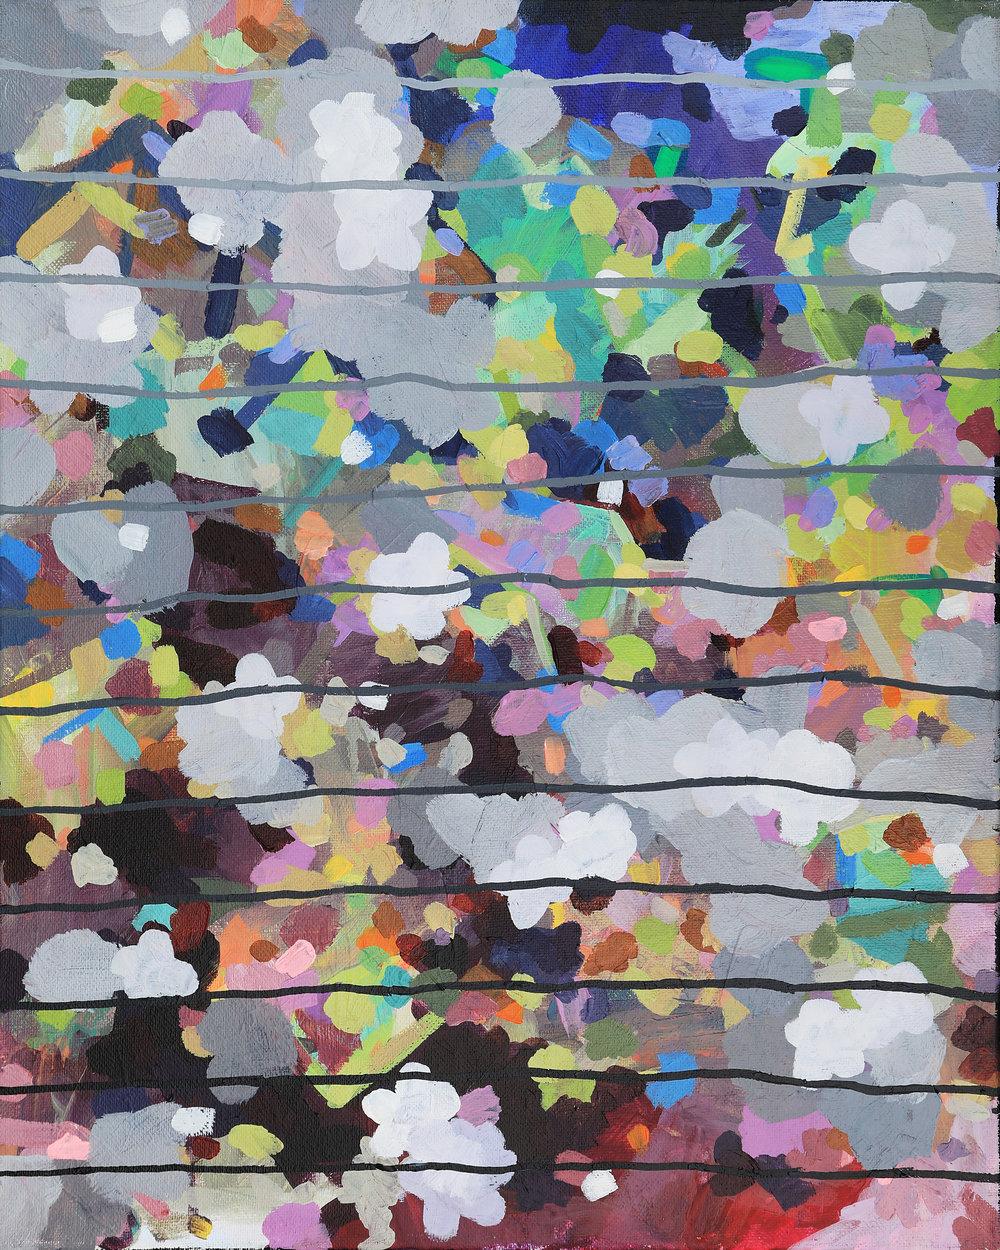 Glitter Bomb.  16in x 20in. Brianna Bass, 2015.